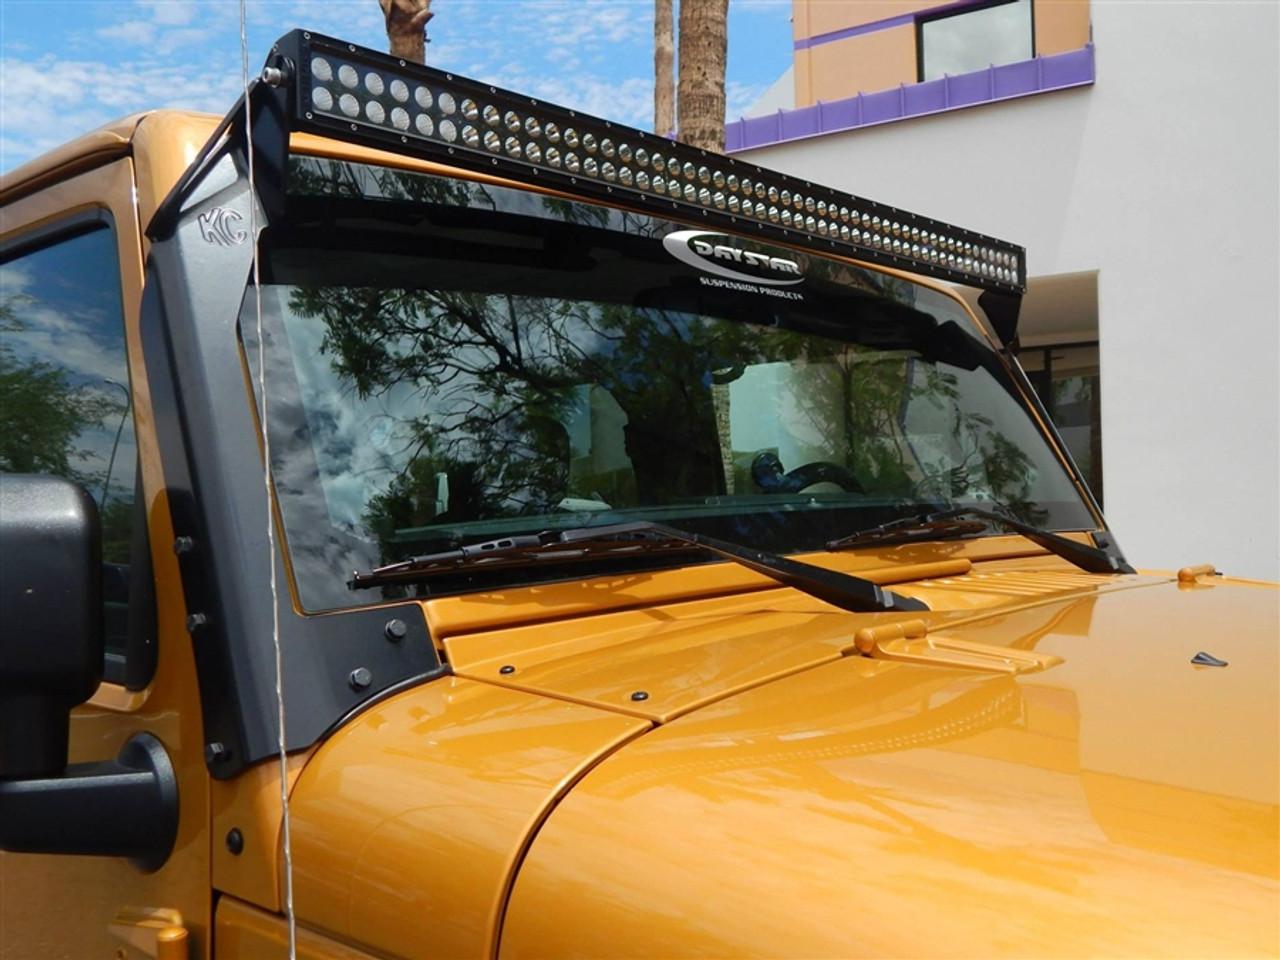 100W Halogen -Chrome 2002 Kia SEPHIA GTS Post Mount Spotlight Passenger Side with Install Kit Larson Electronics 1015P9IPVH4 6 inch